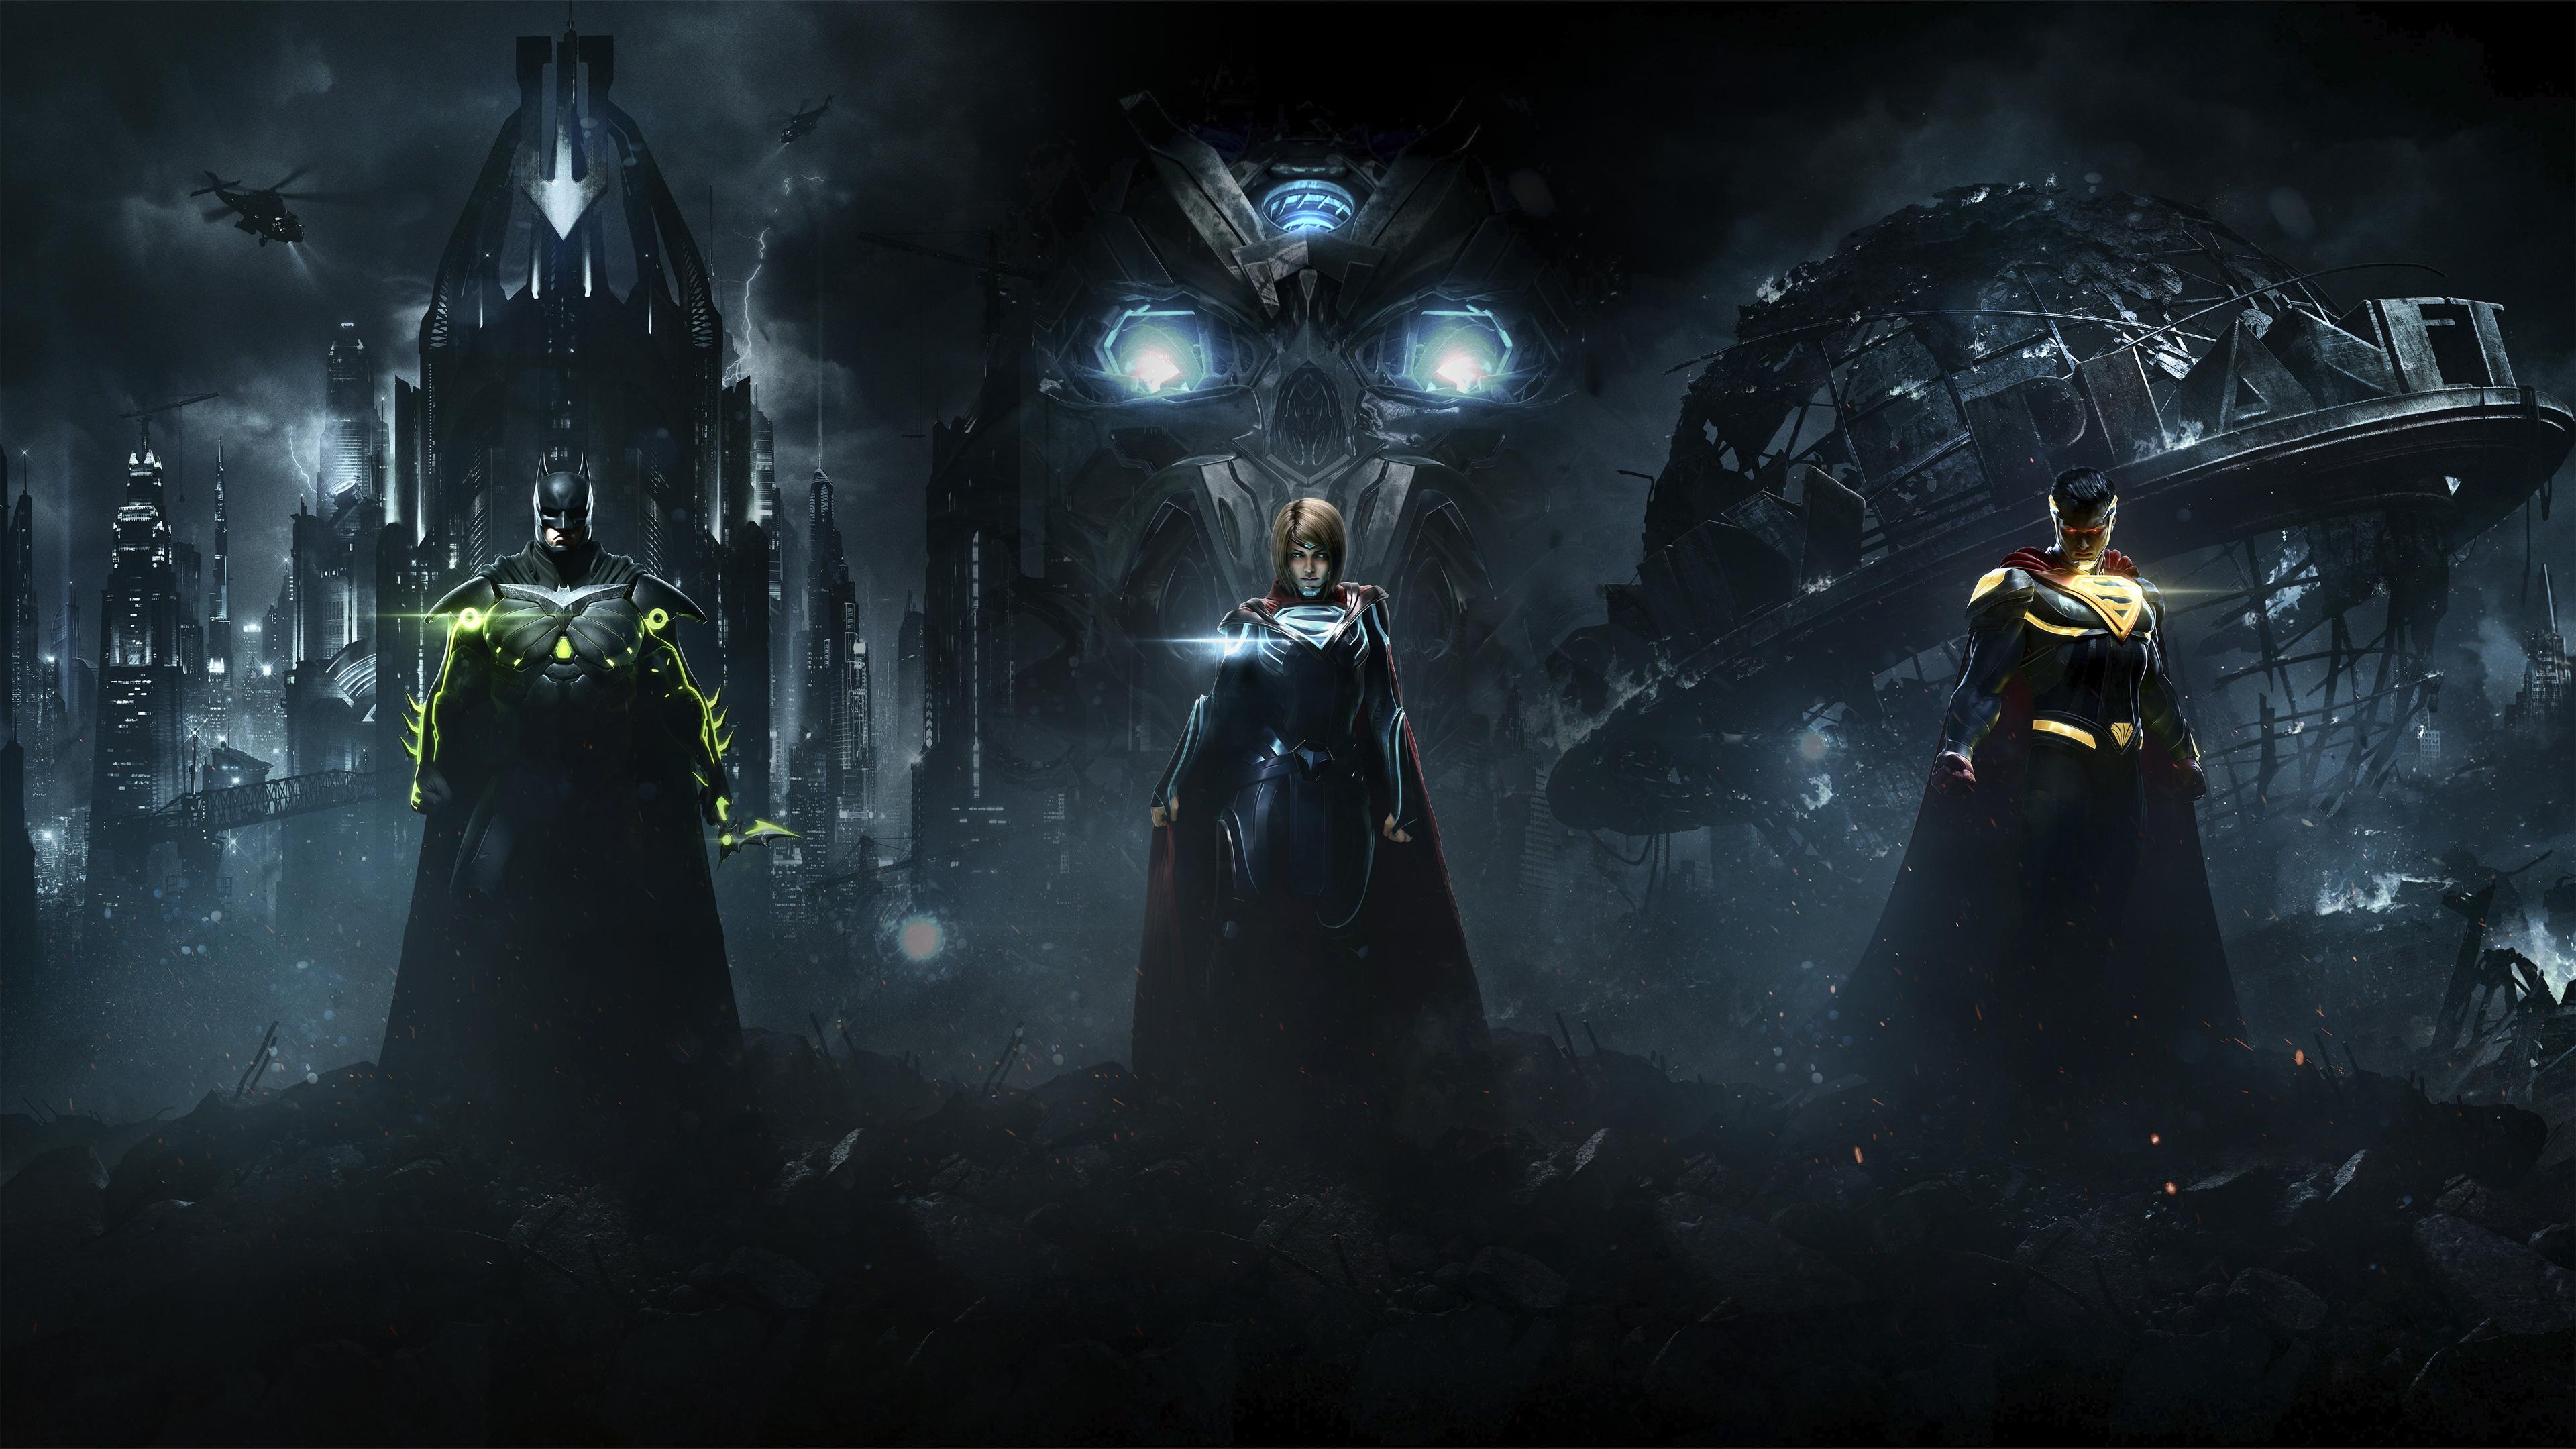 Injustice batman wallpaper hd olivero injustice 2 superman supergirl batman combine 4k hd games voltagebd Choice Image